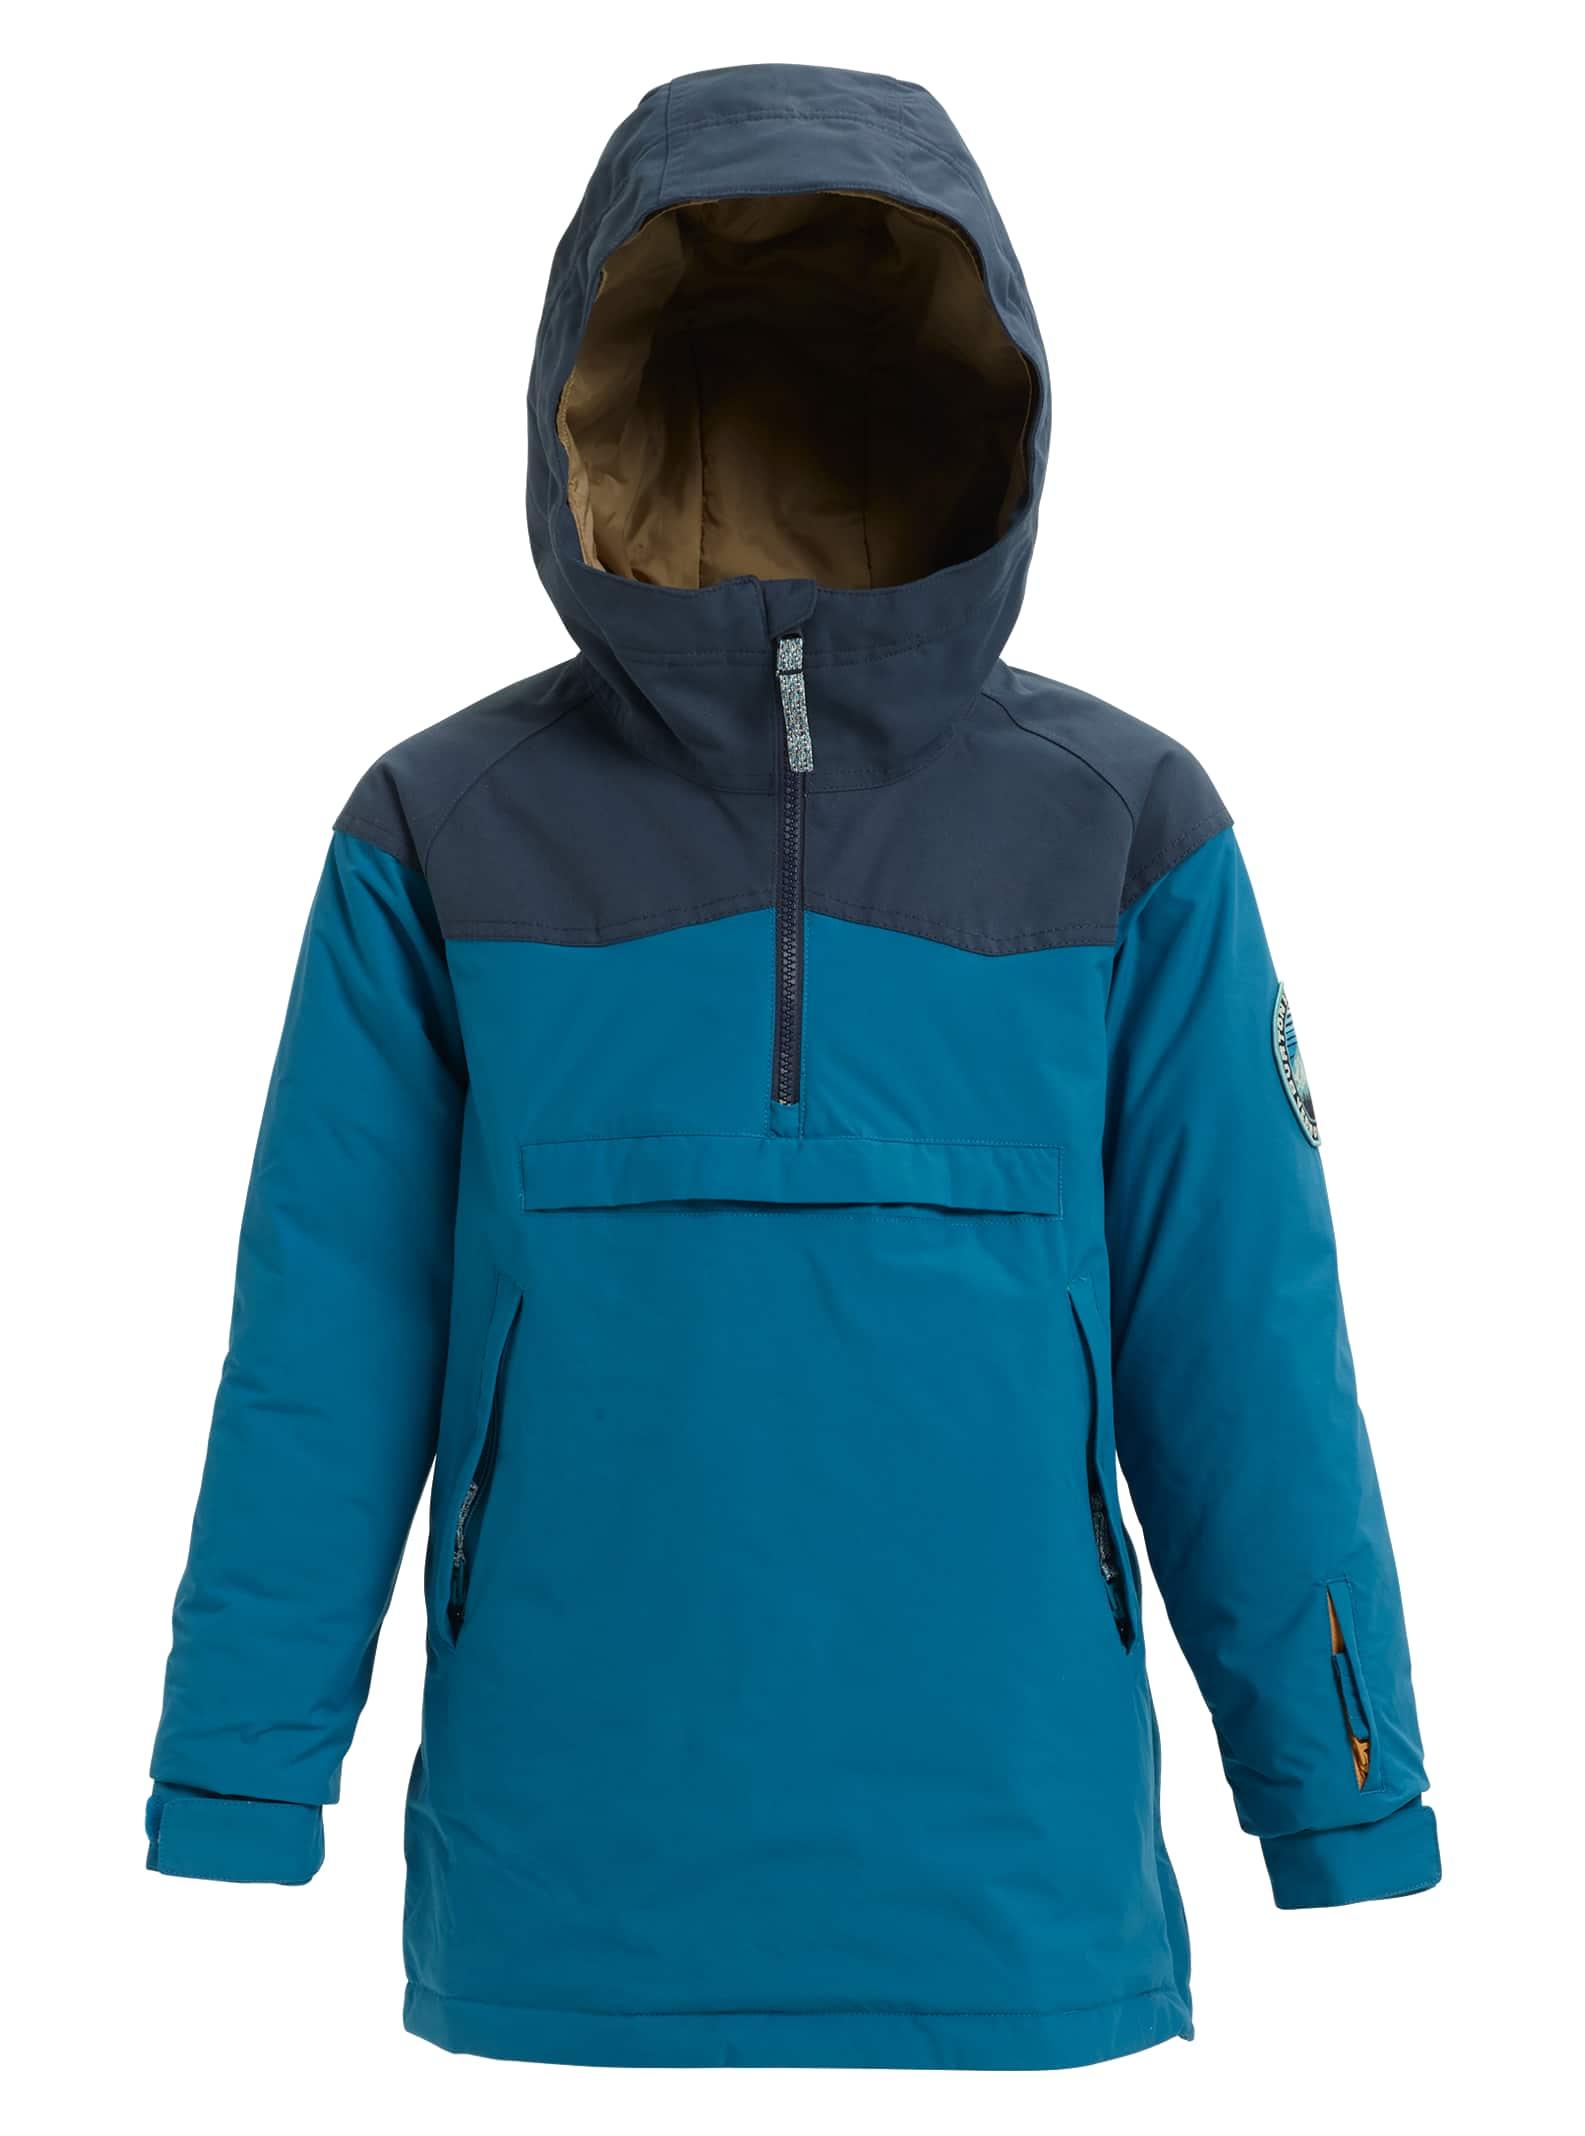 4b314ce3 Kids' Snowboard Jackets | Burton Snowboards